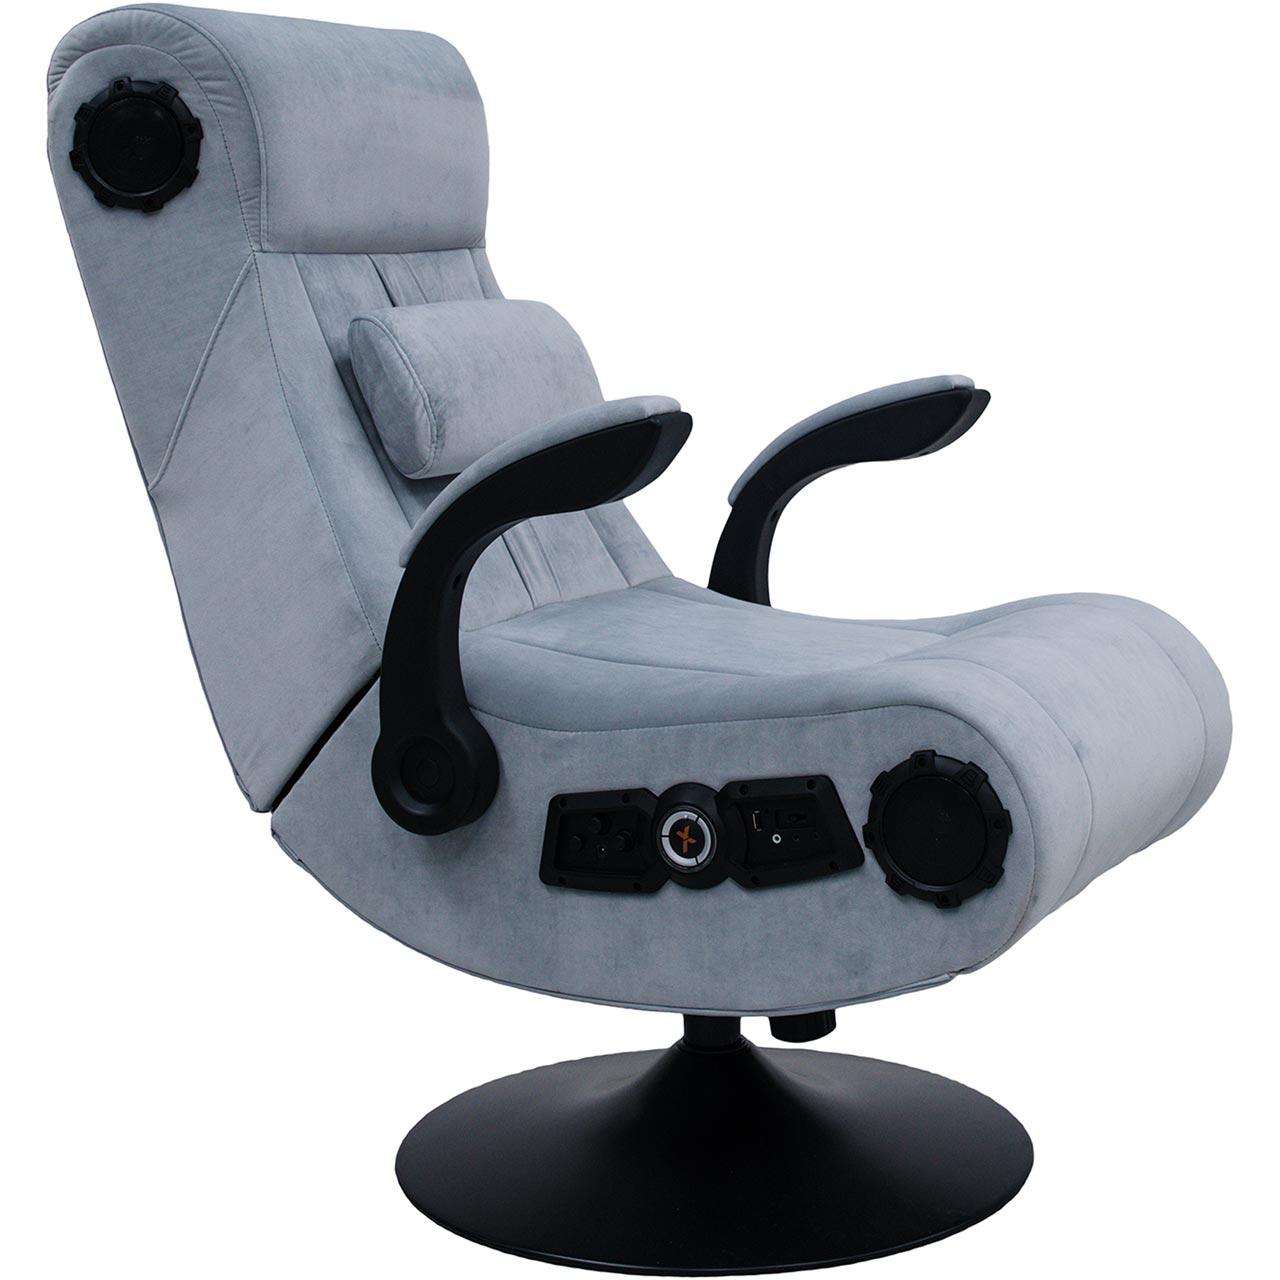 Admirable X Rocker Wireless Deluxe Gaming Chair Grey Uwap Interior Chair Design Uwaporg